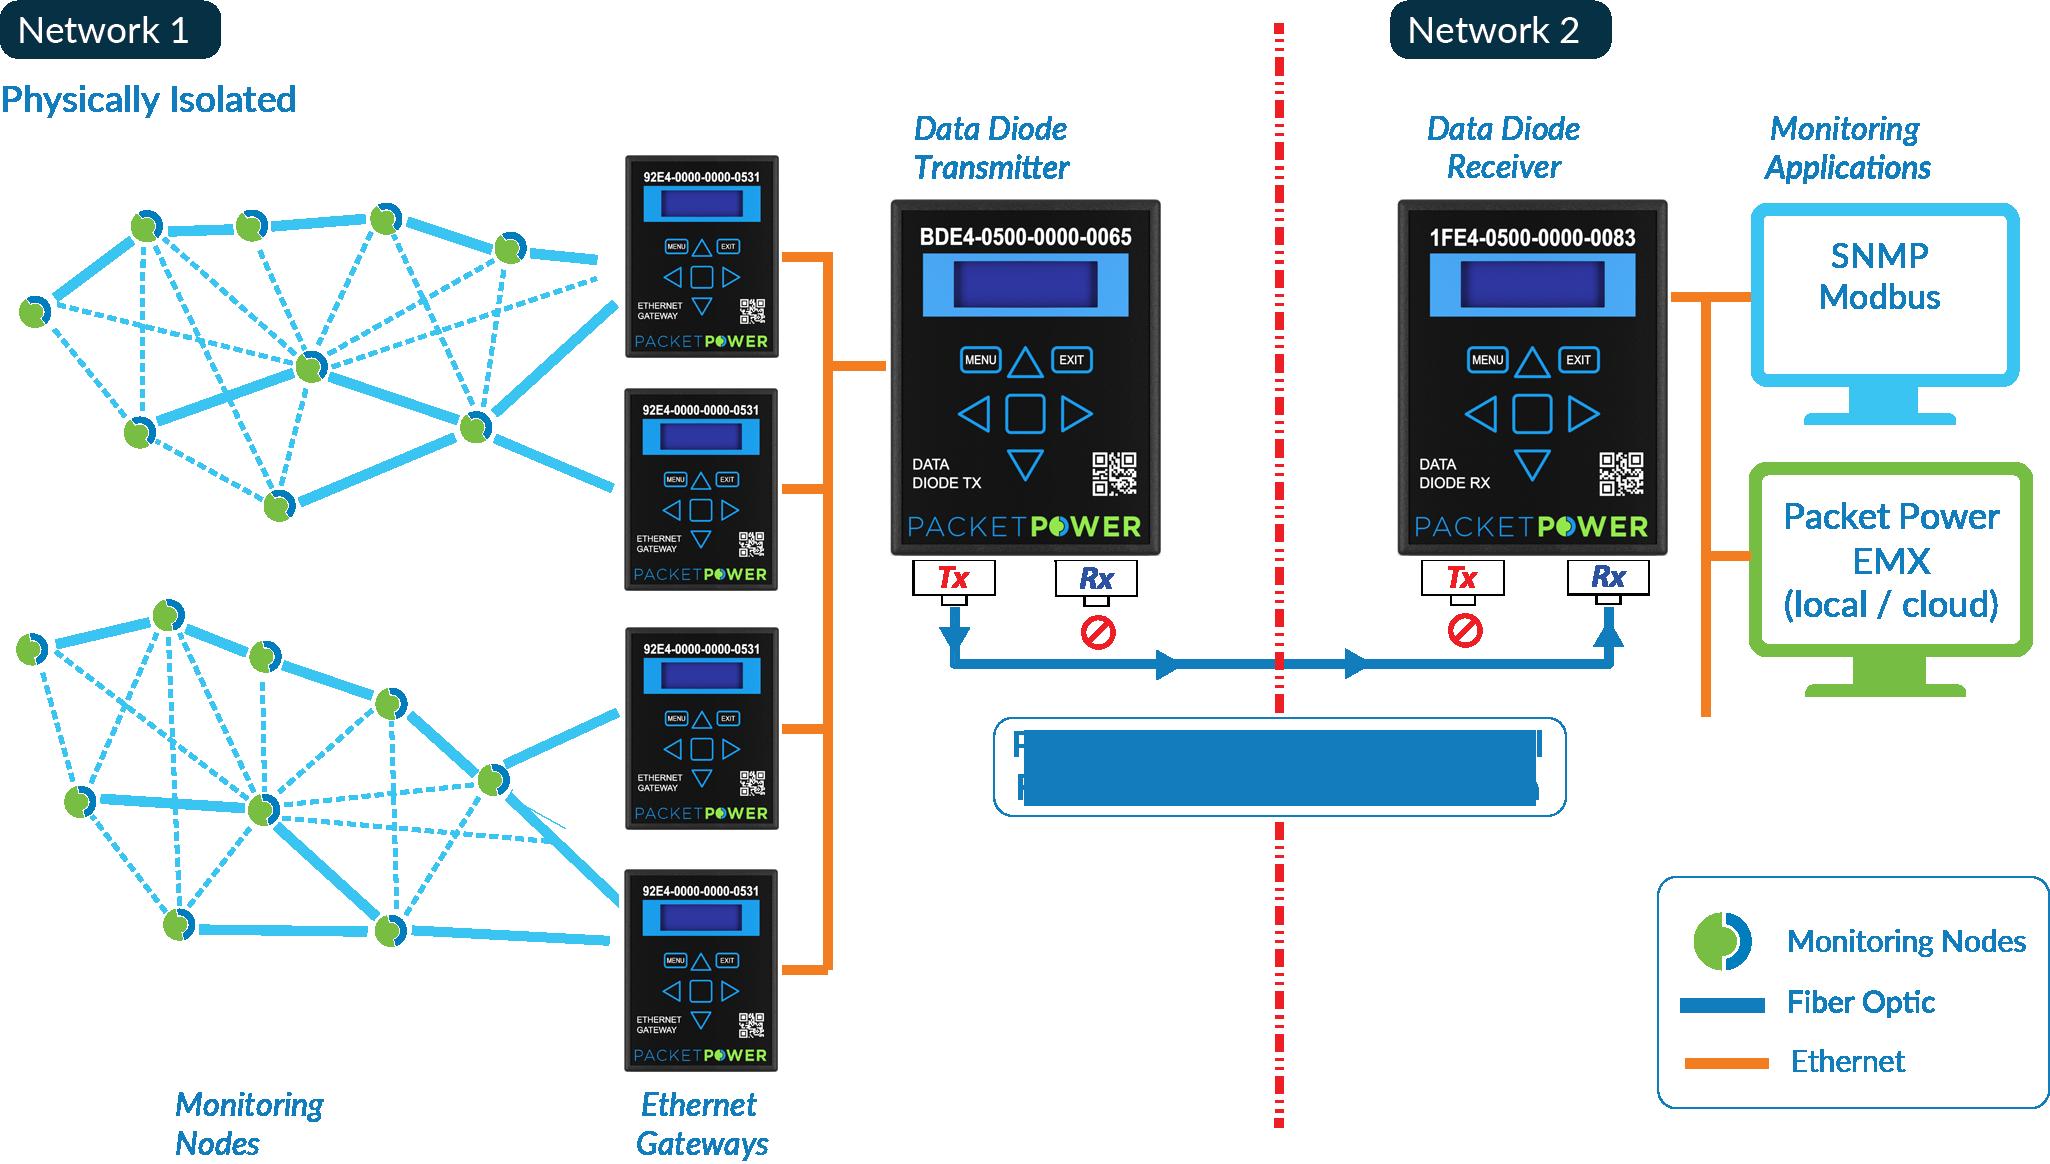 Packet Power Data Diode full network